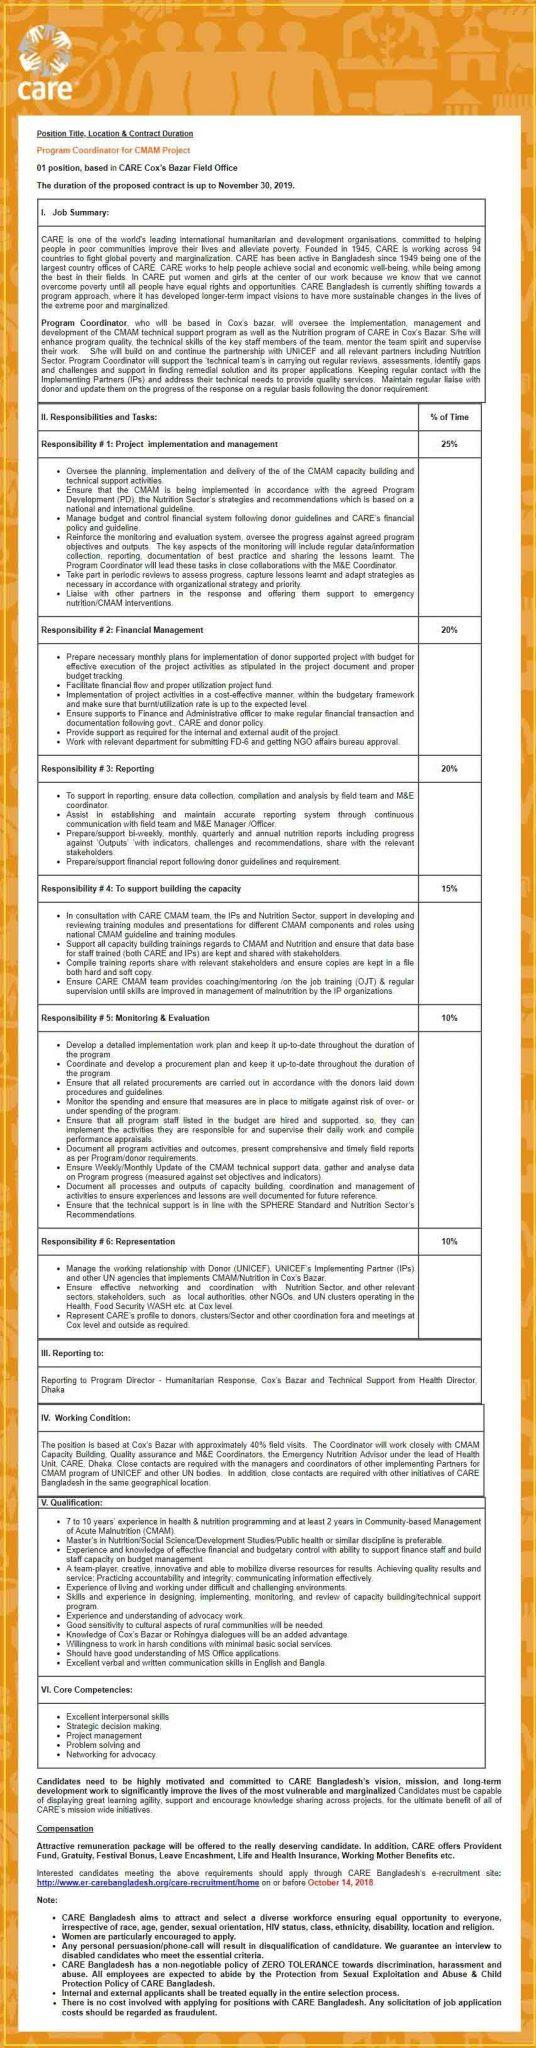 Care-Bangladesh-Jobs-Circular-2018